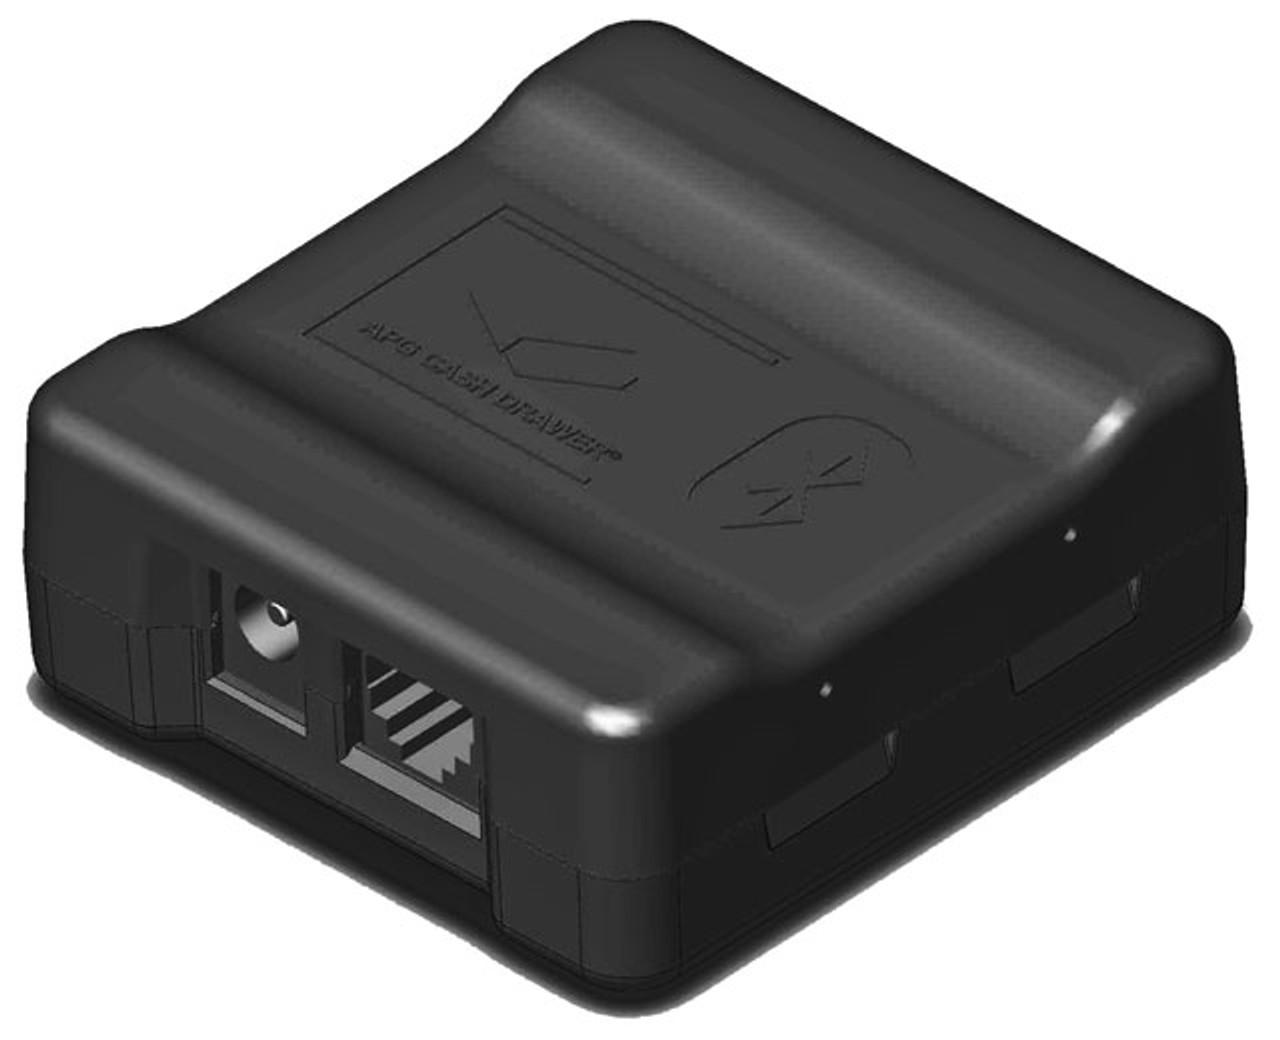 APG 510 BluePro Bluetooth Interface Device